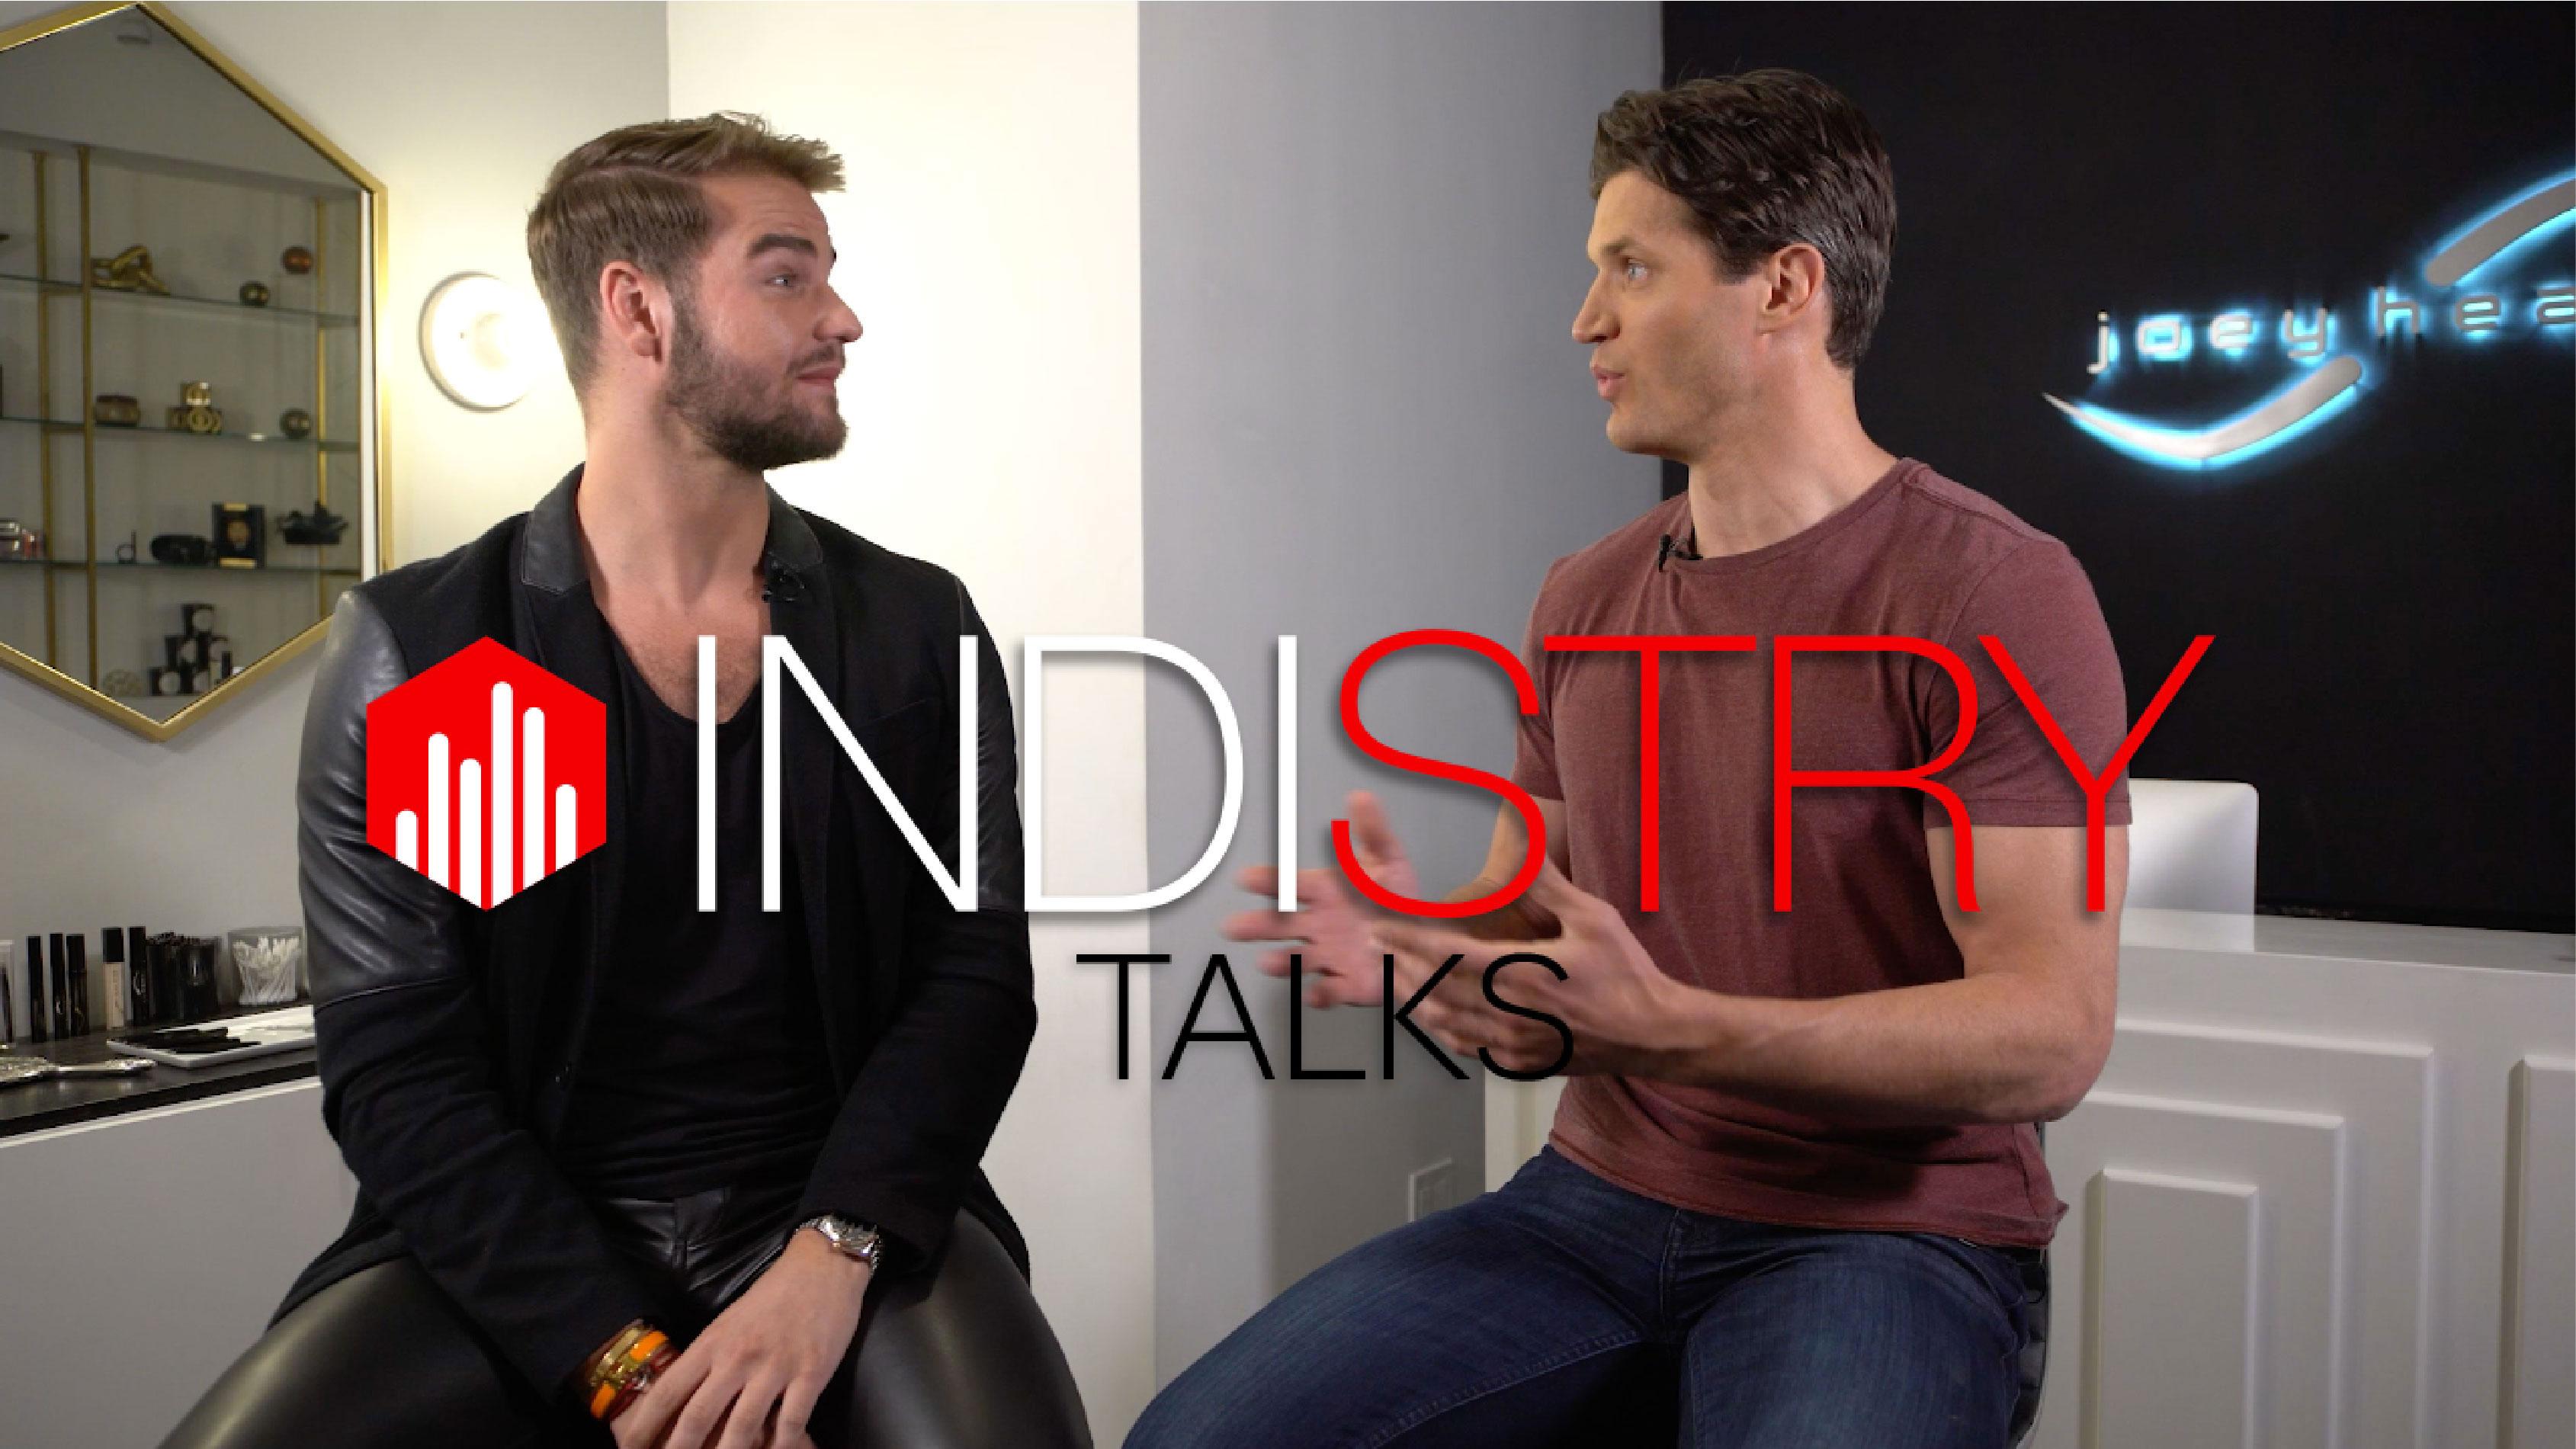 INDISTRY Talks